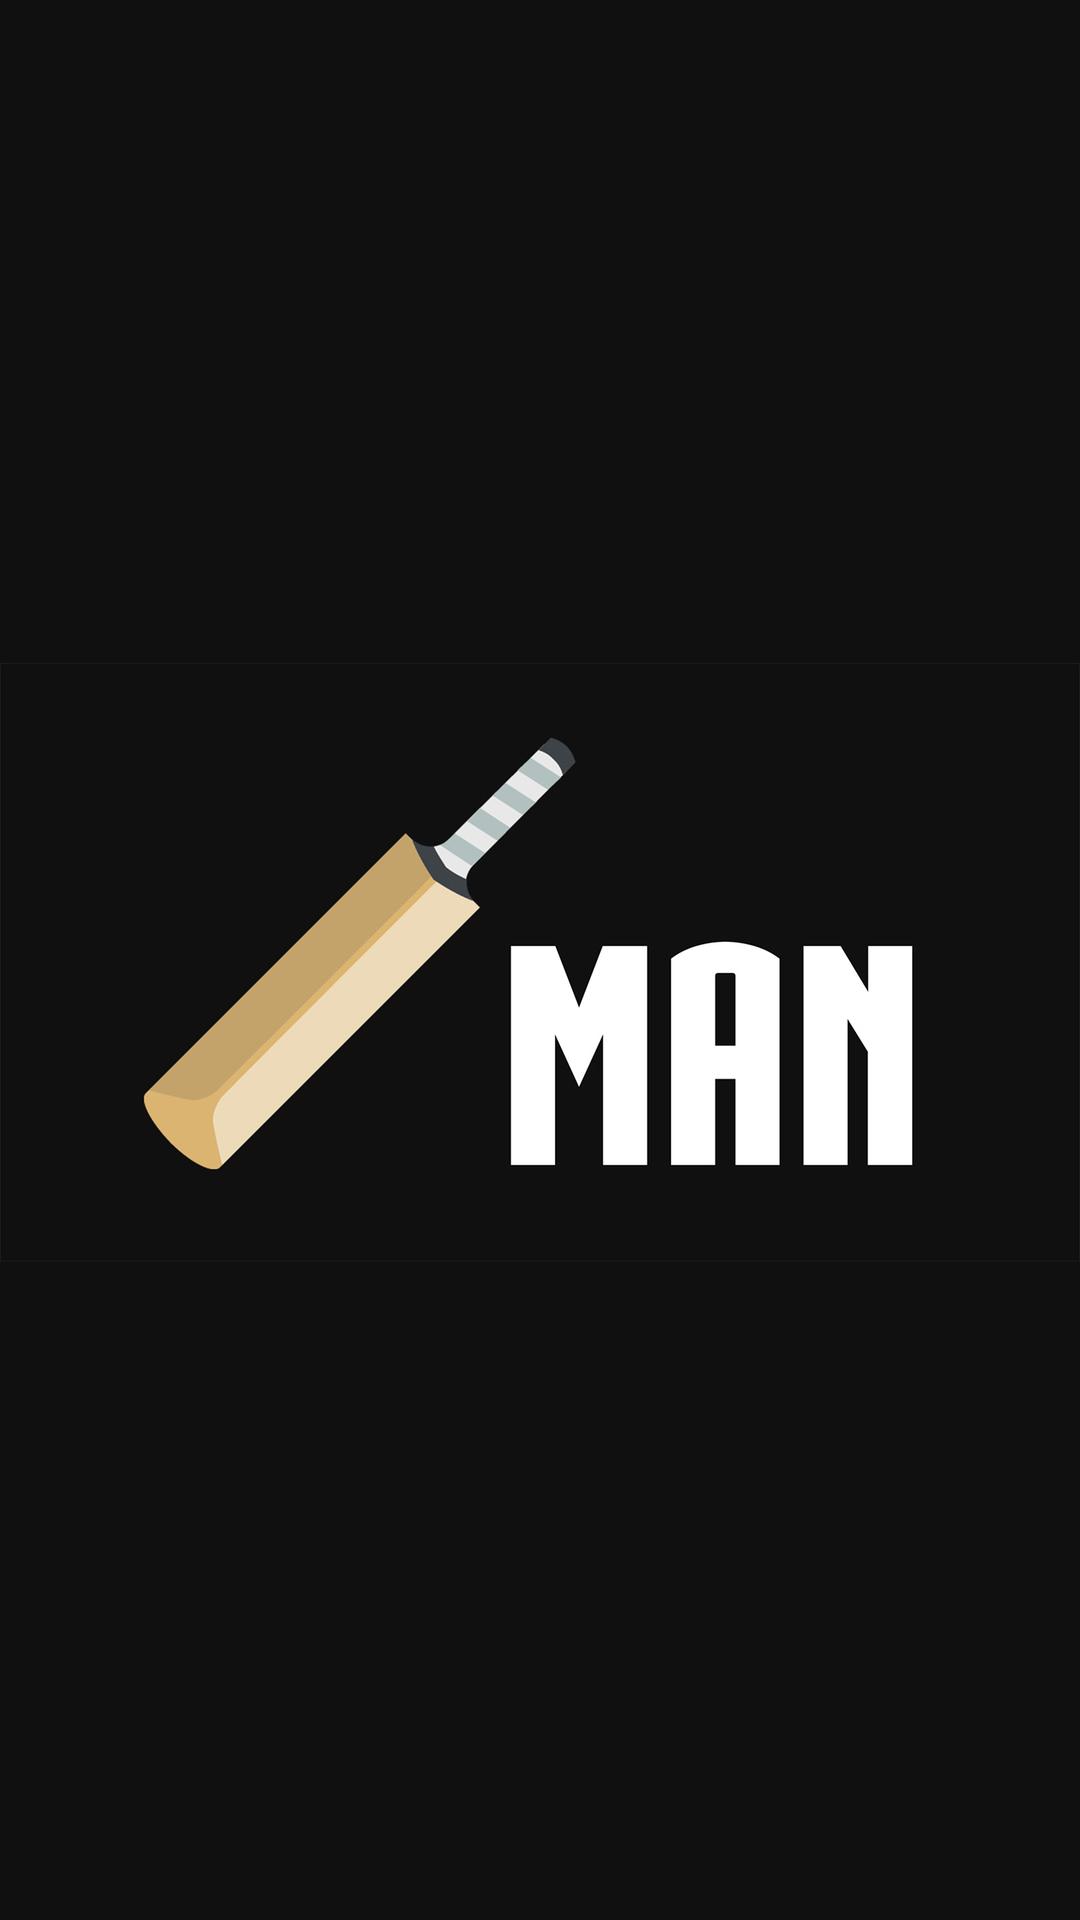 Batman Logo Minimalism Hd Uk